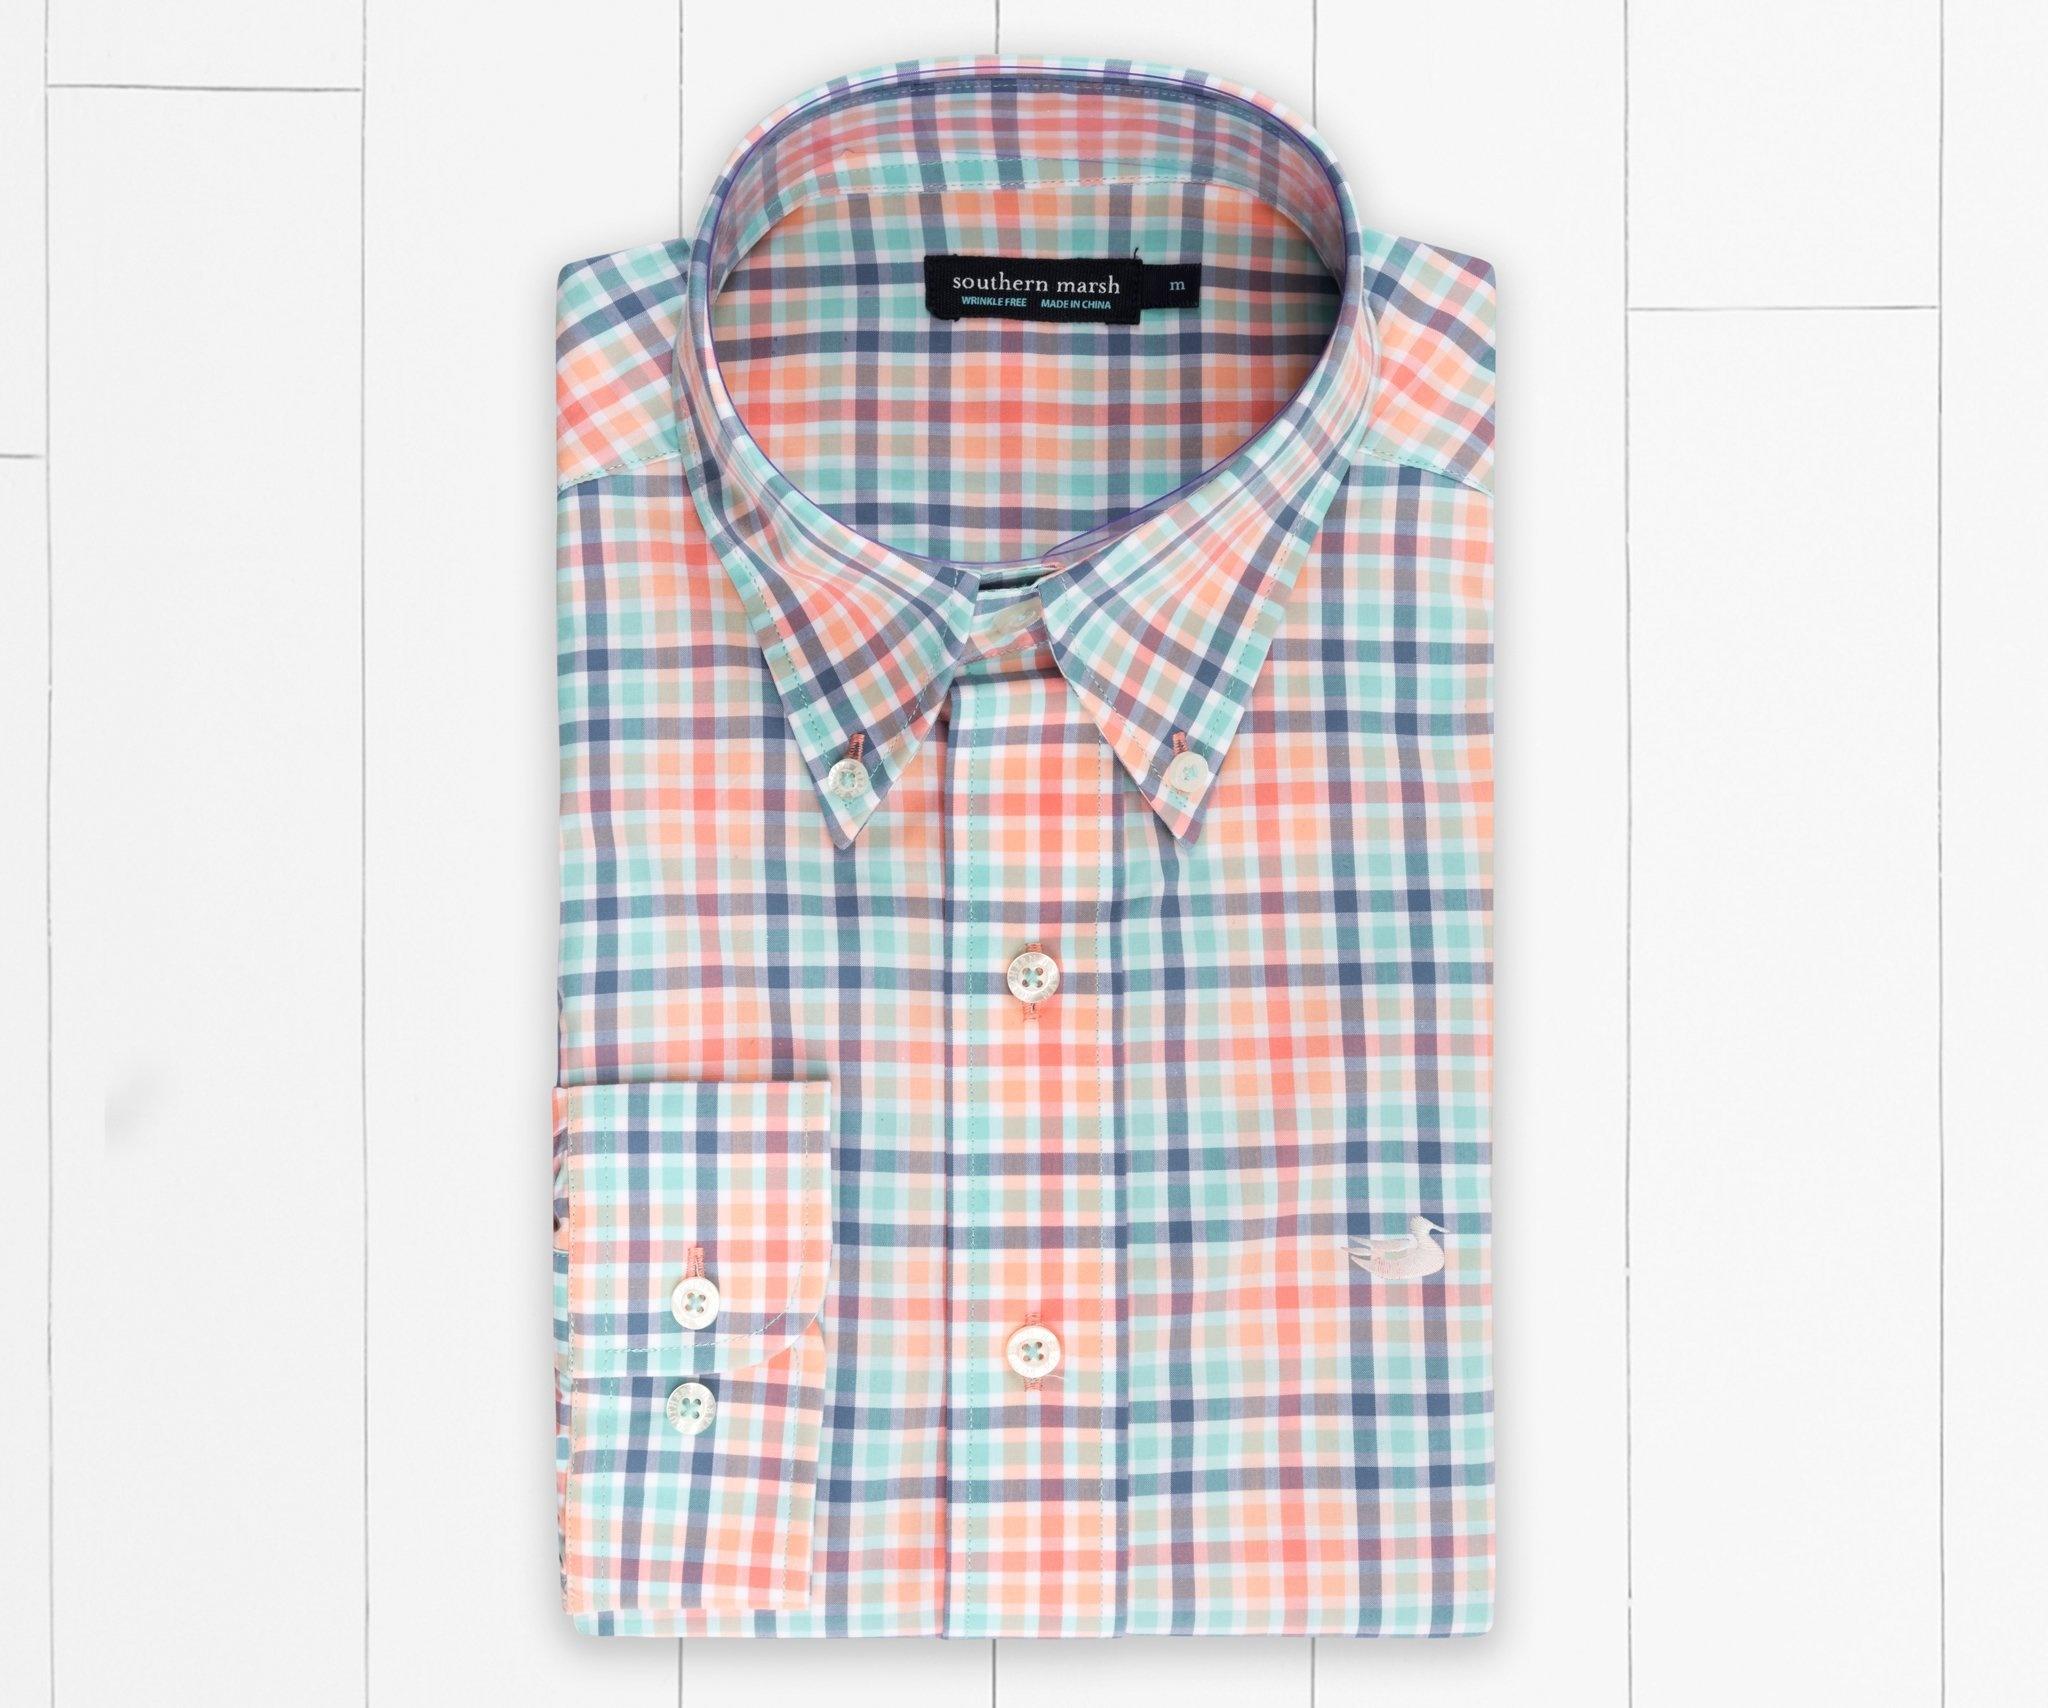 Southern Marsh Southern Marsh Juban Check Dress Shirt - Wrinkle-Free